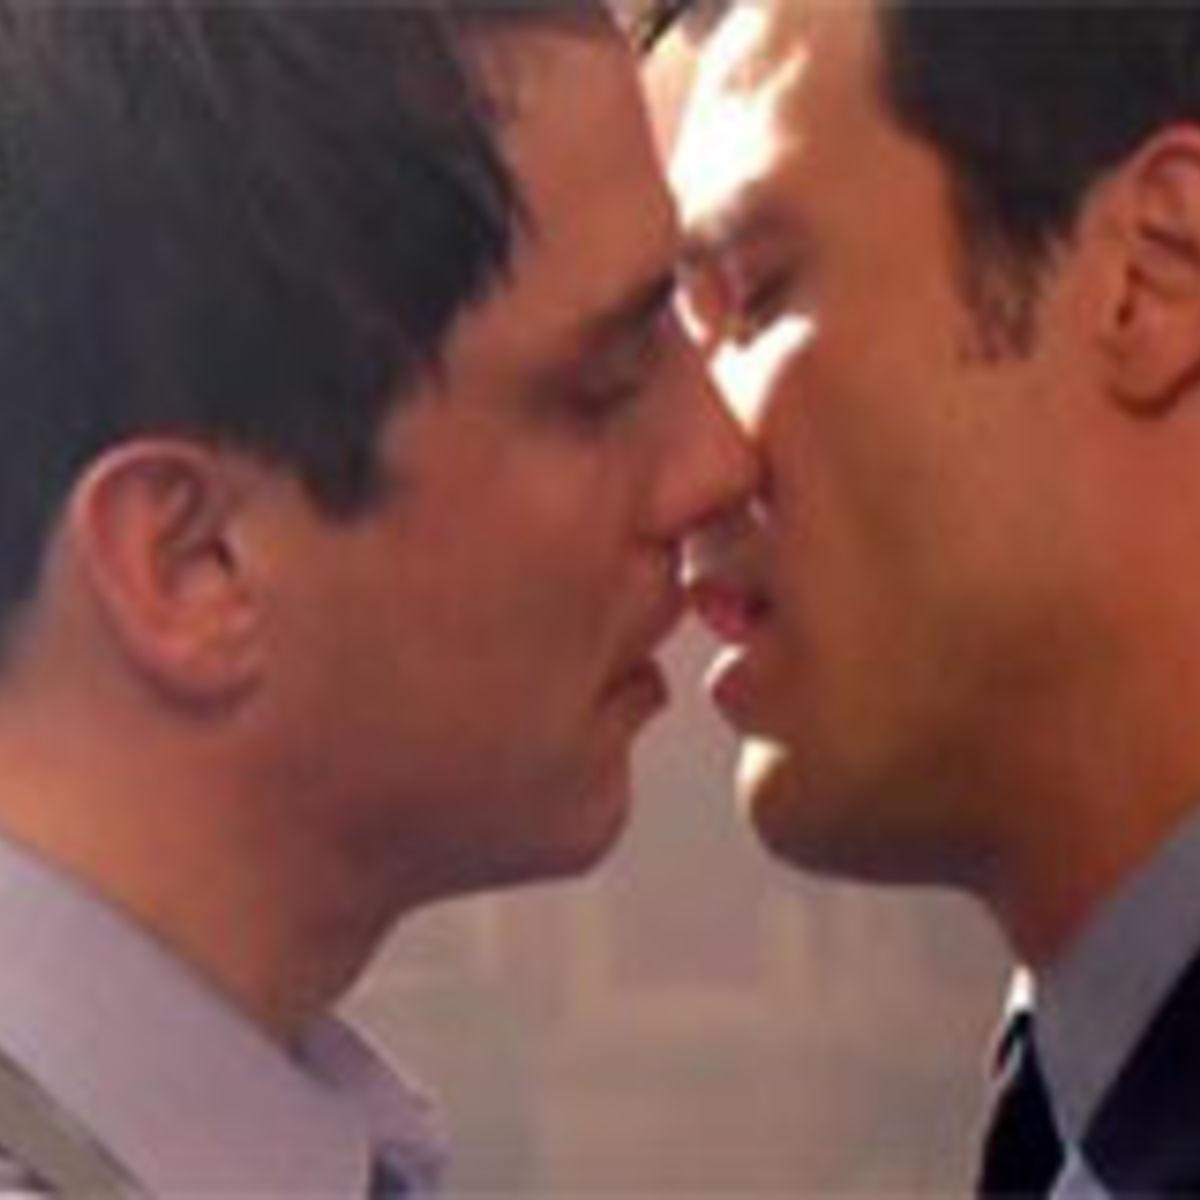 Supernatural homosexual undertones